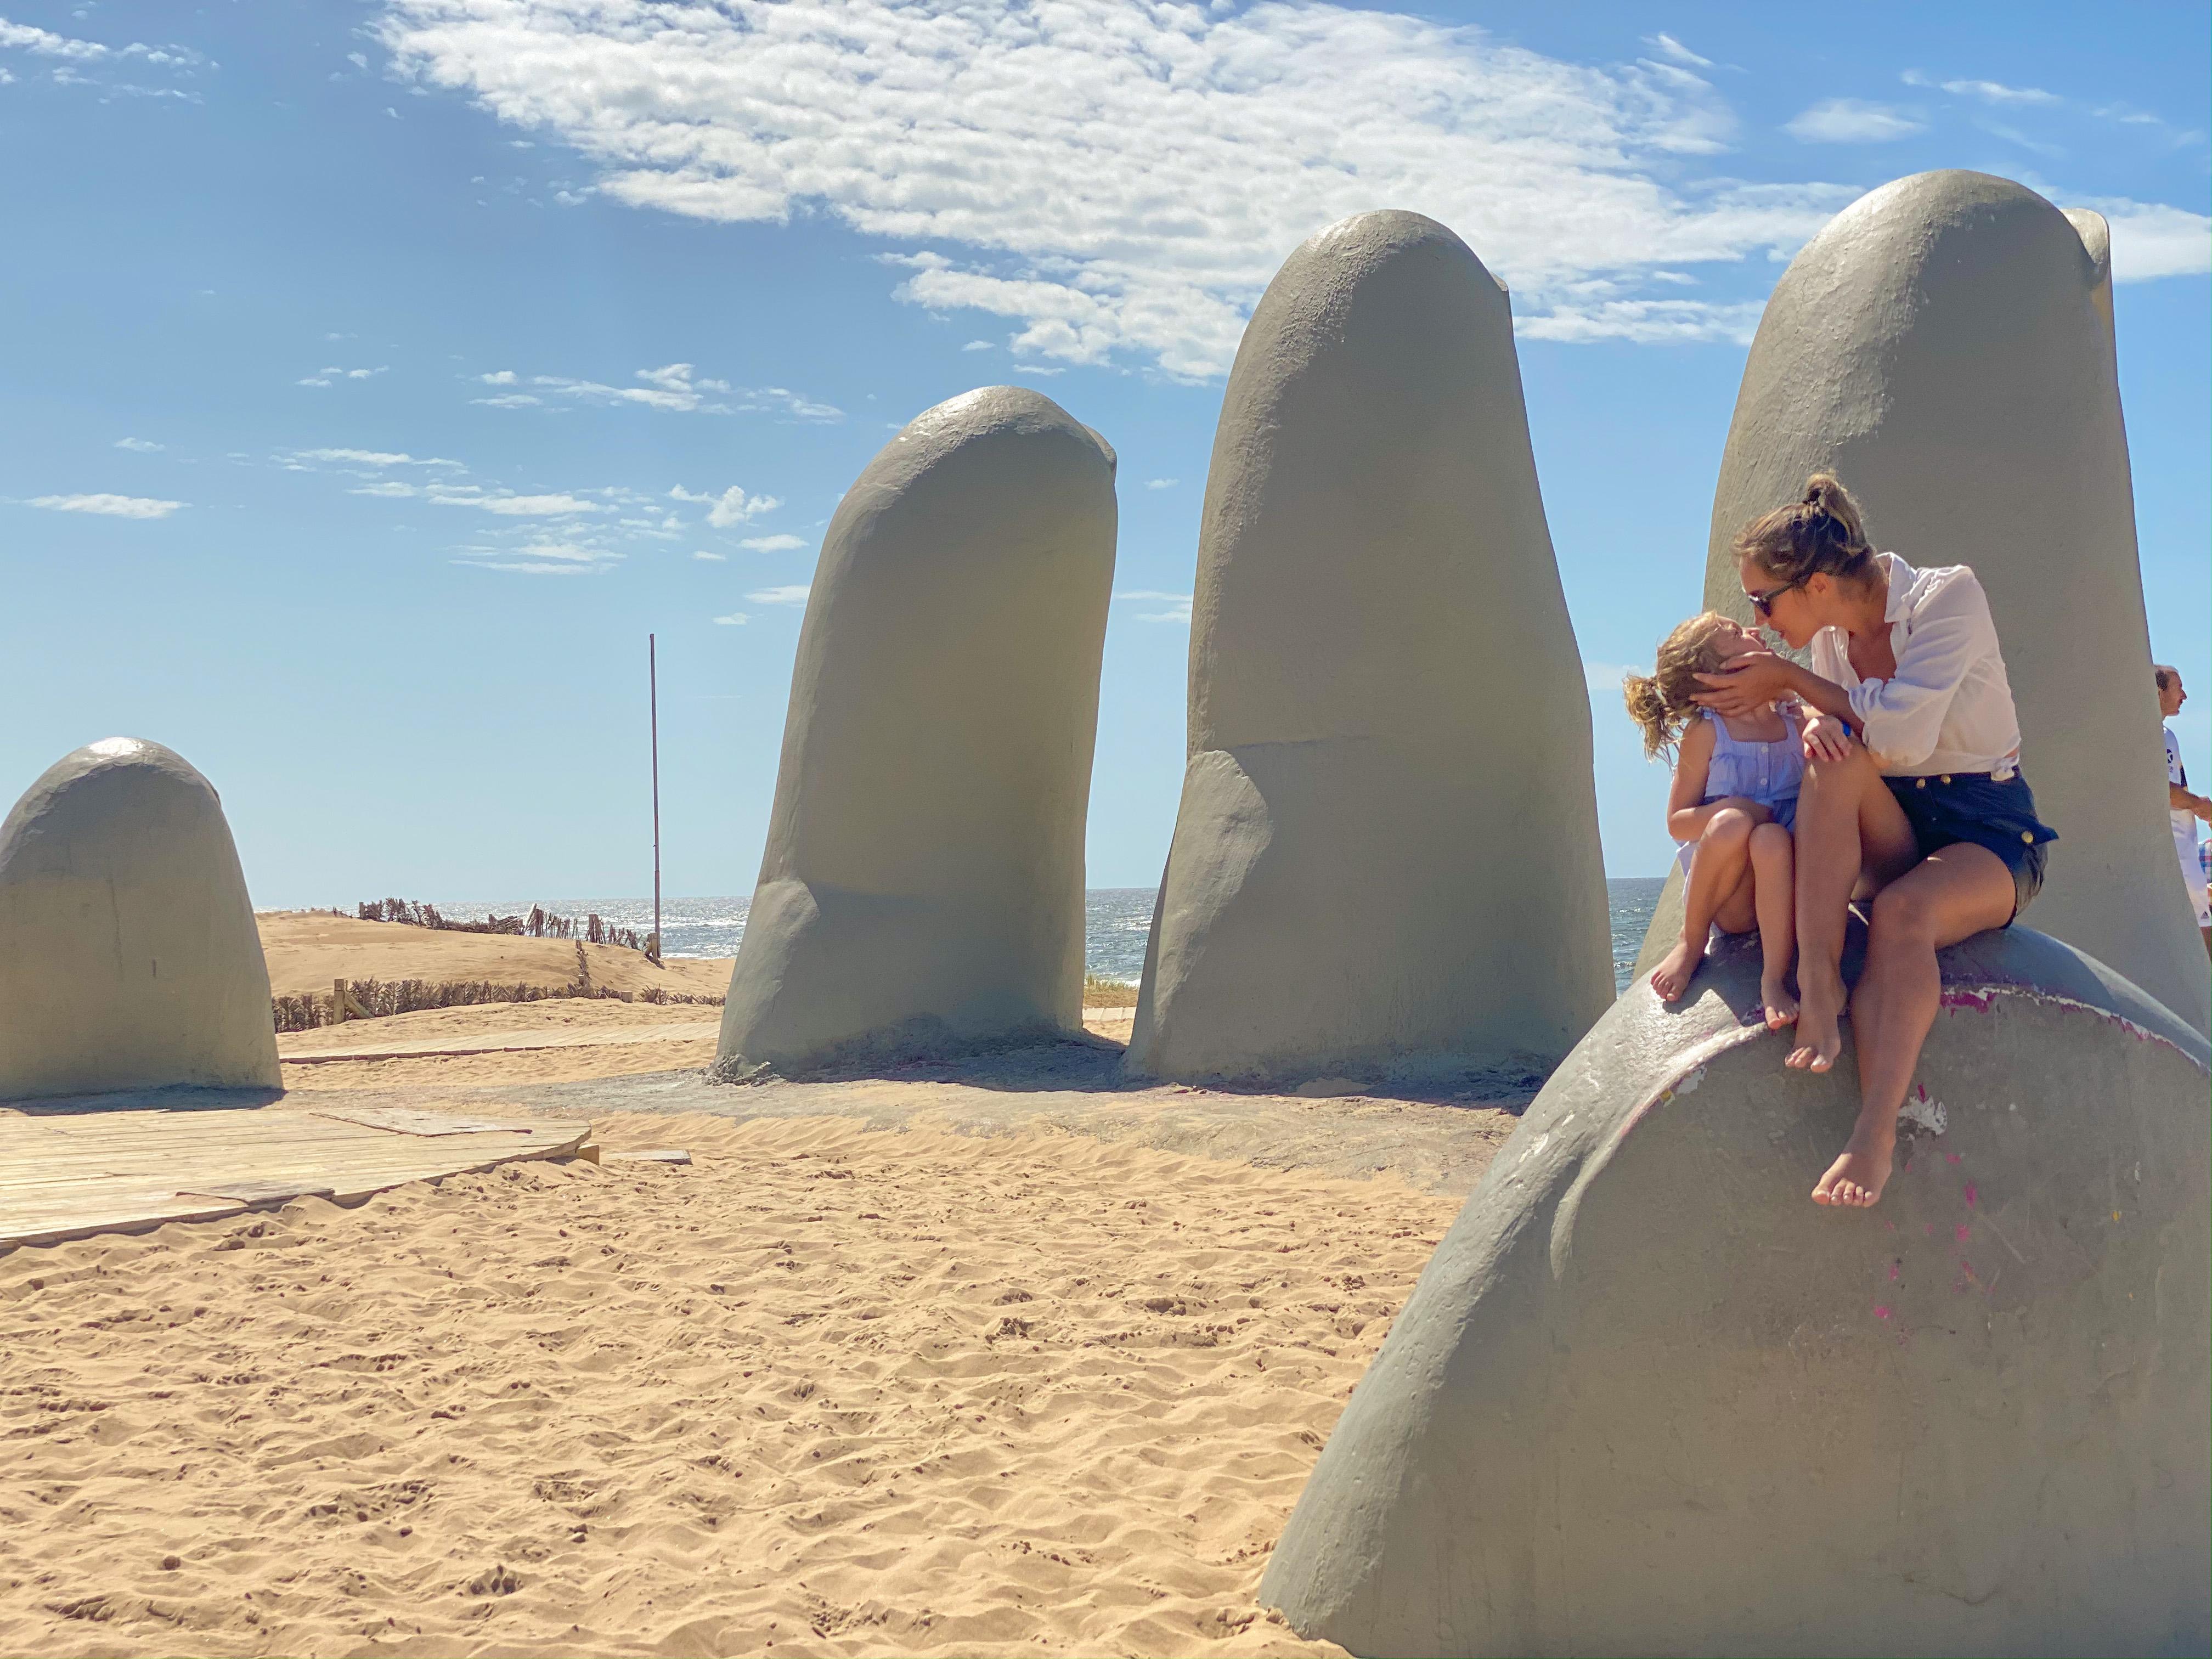 o que fazer Punta Del este , atividades Punta Del este , passeio Punta Del este